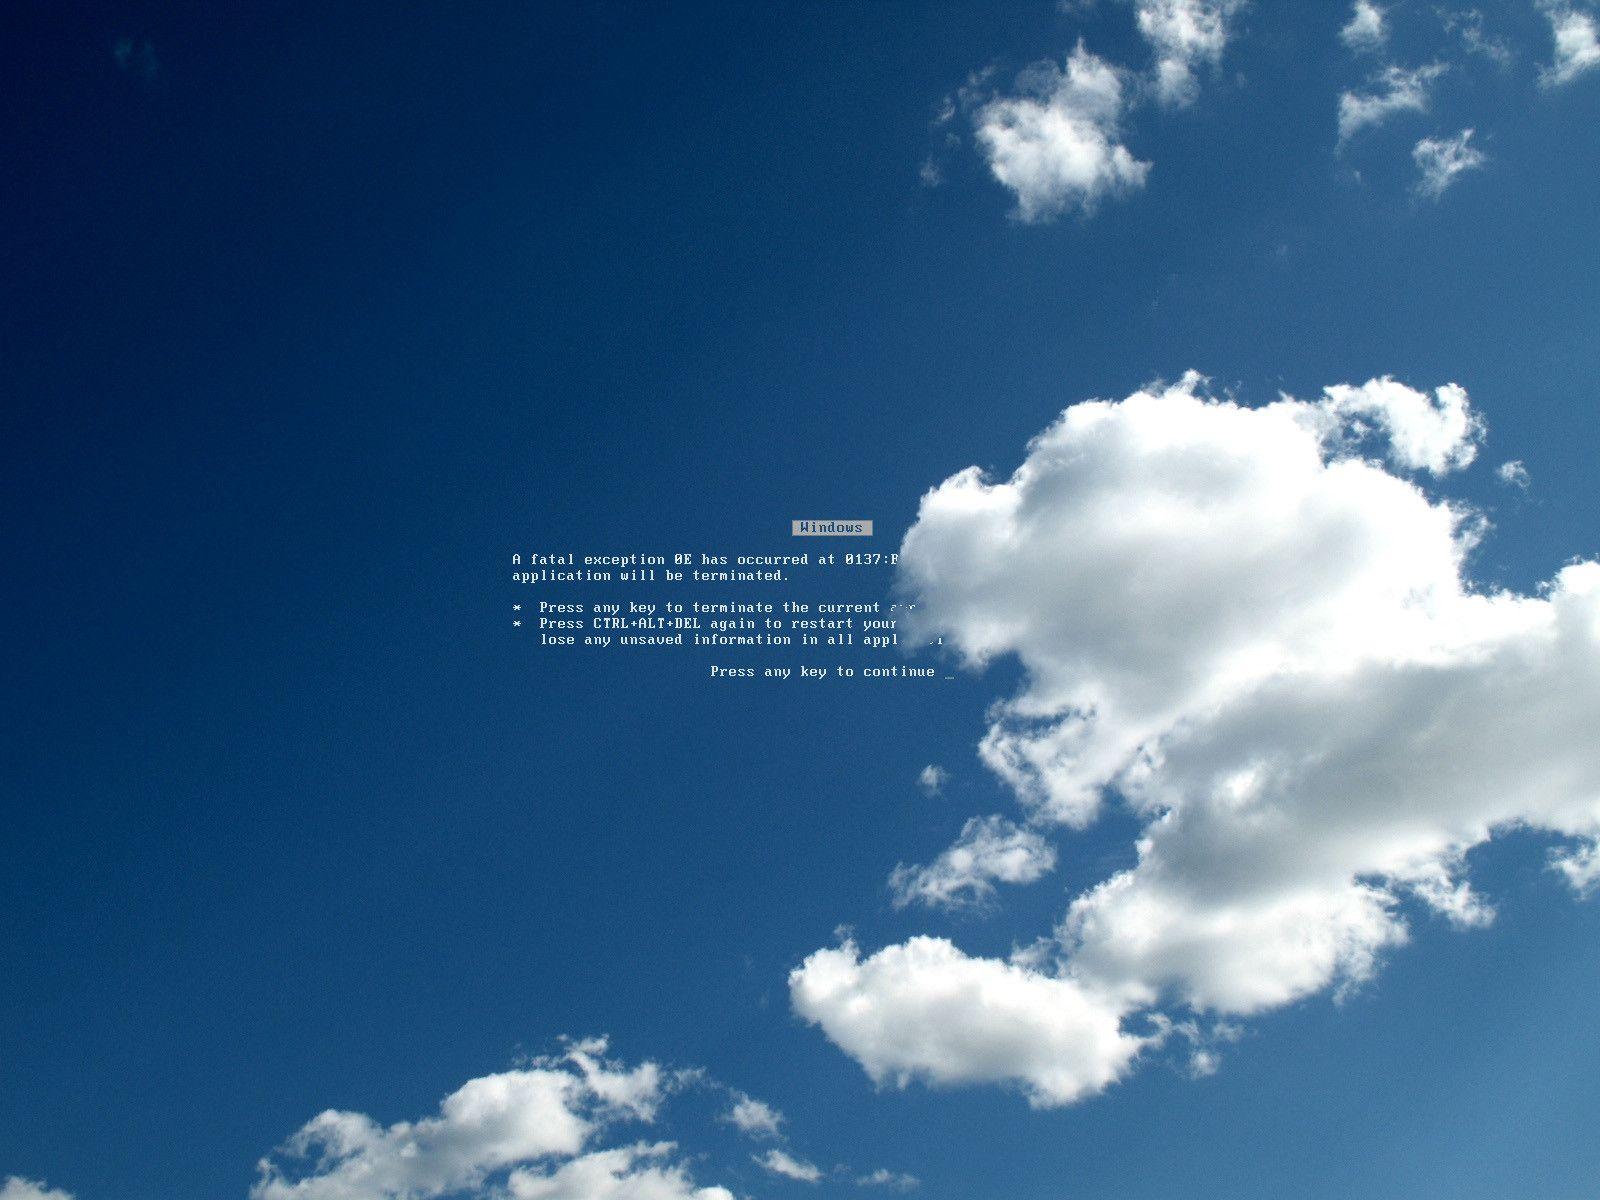 Pin by Gabe Densmore on Cool Desktop Wallpaper Clouds